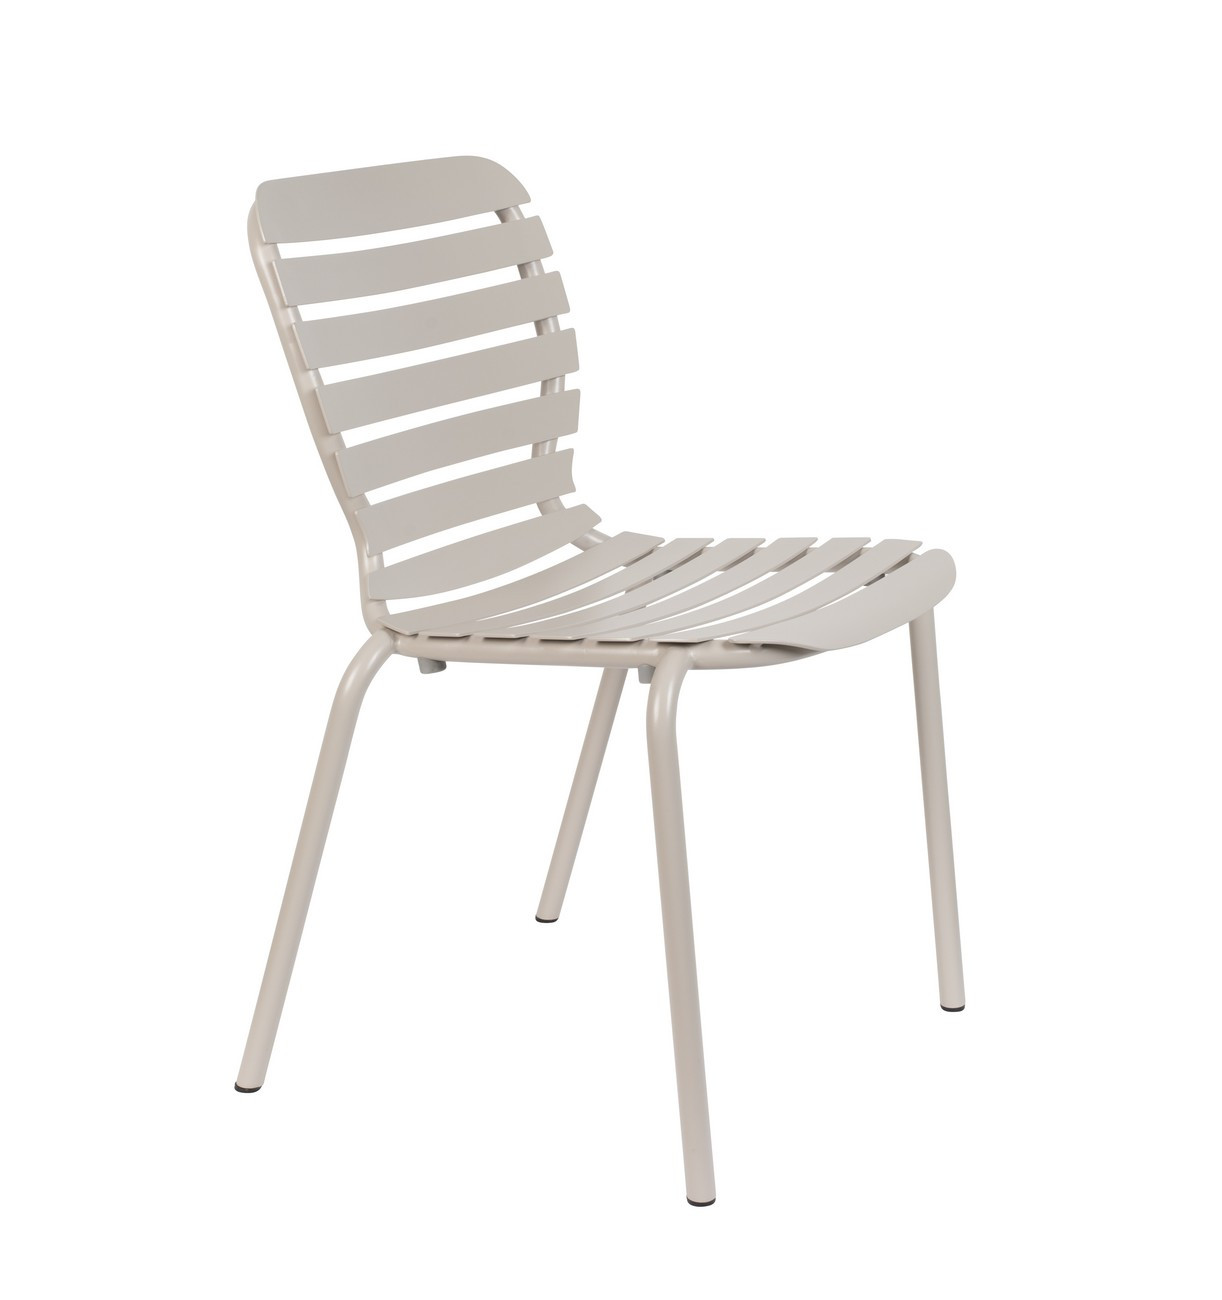 Chaise de jardin en aluminium Argile